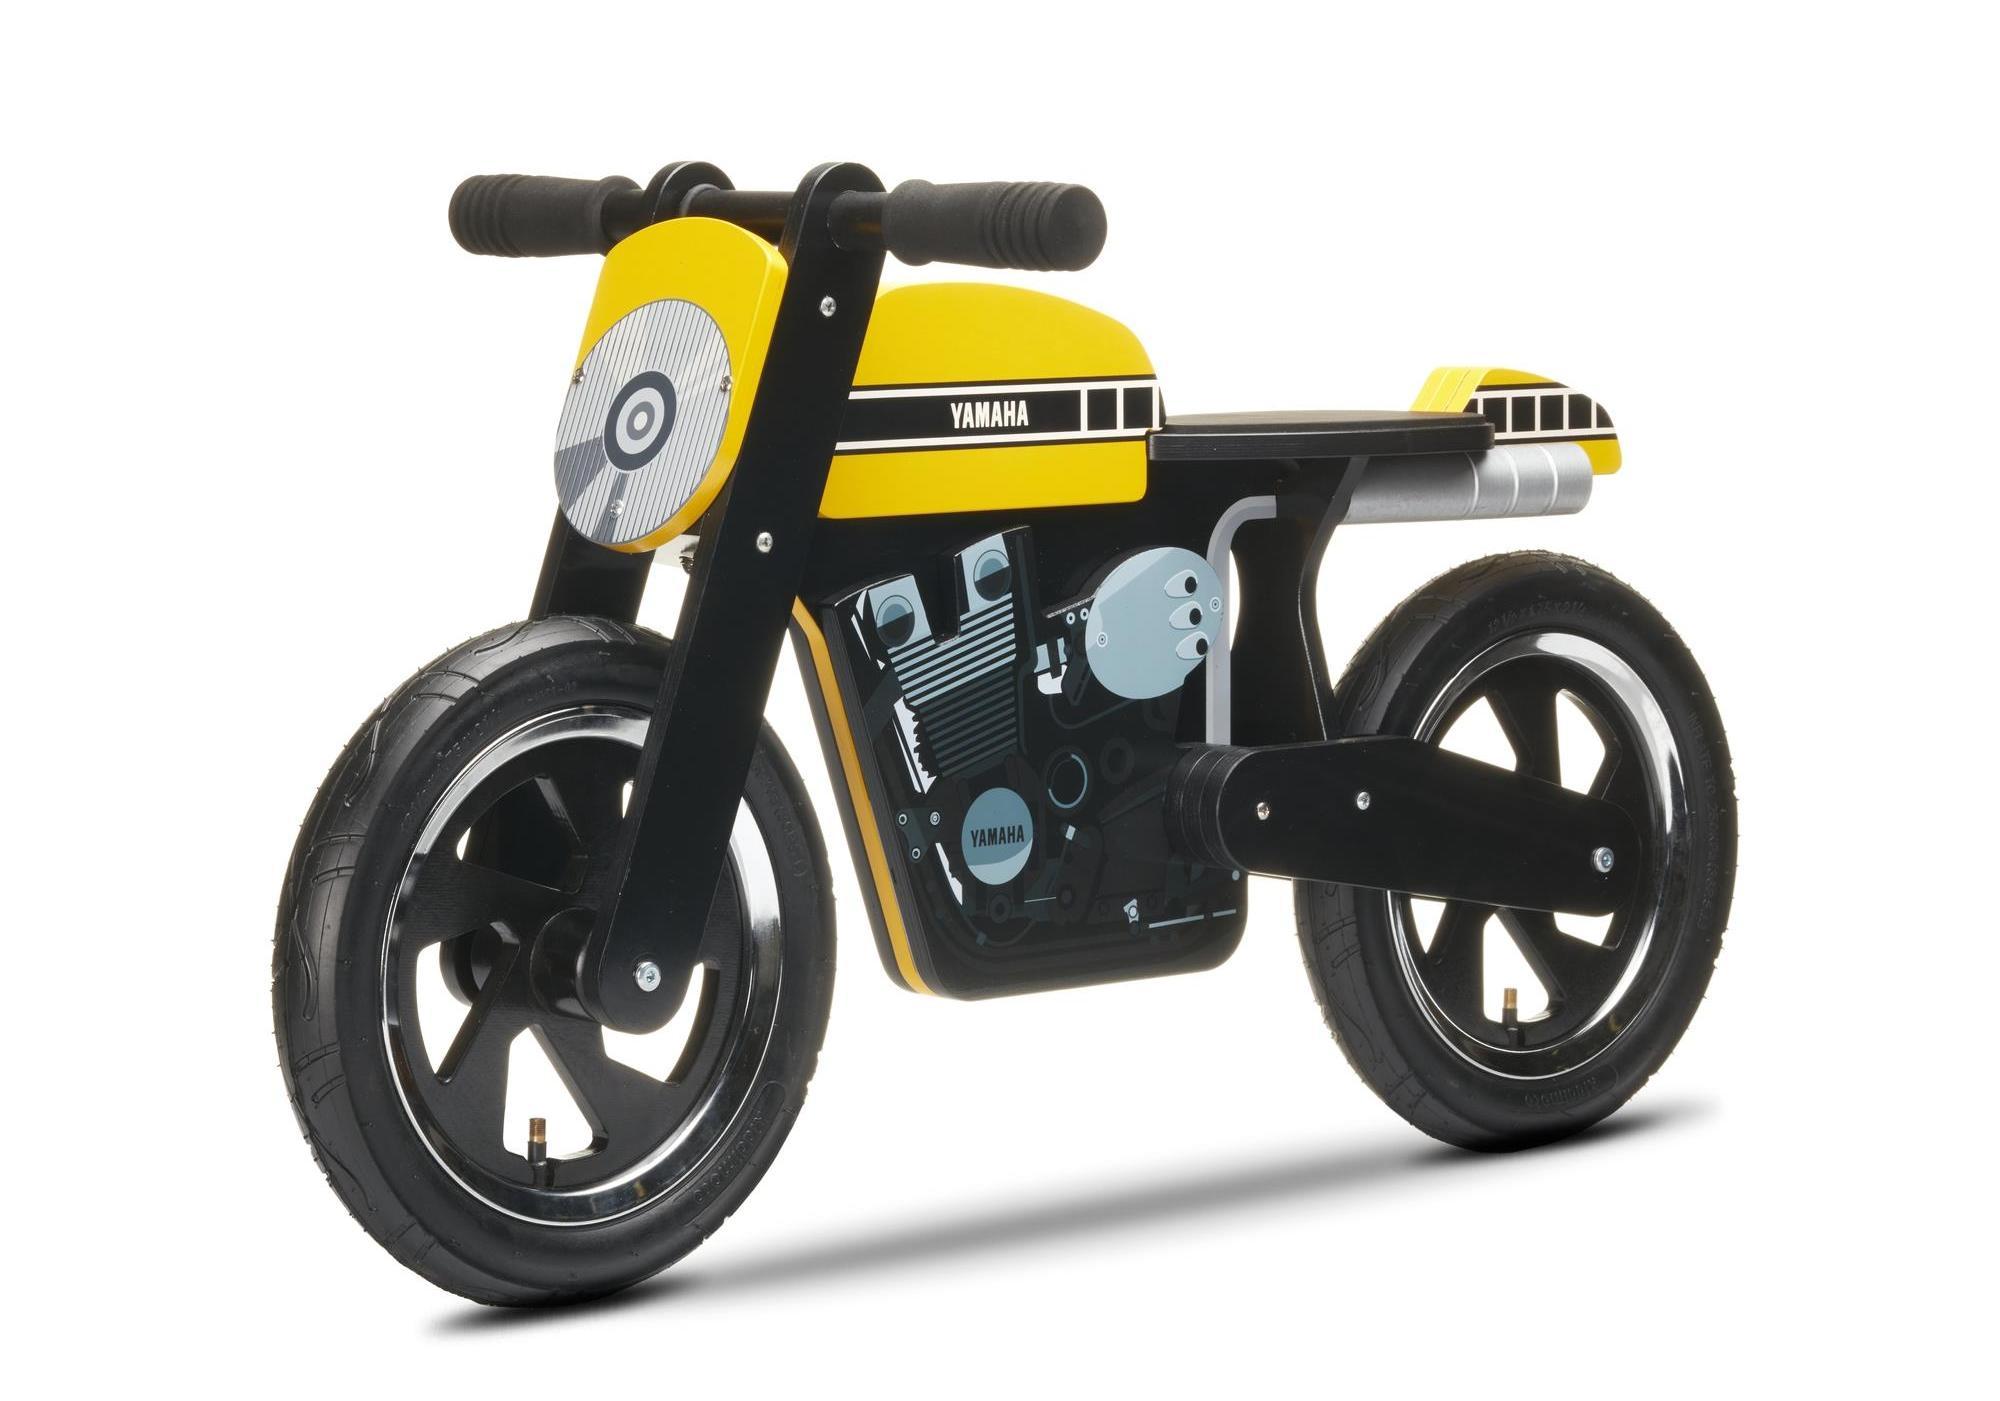 Yamaha Kids Cafe Racer Balance Bike Also Comes In 60th